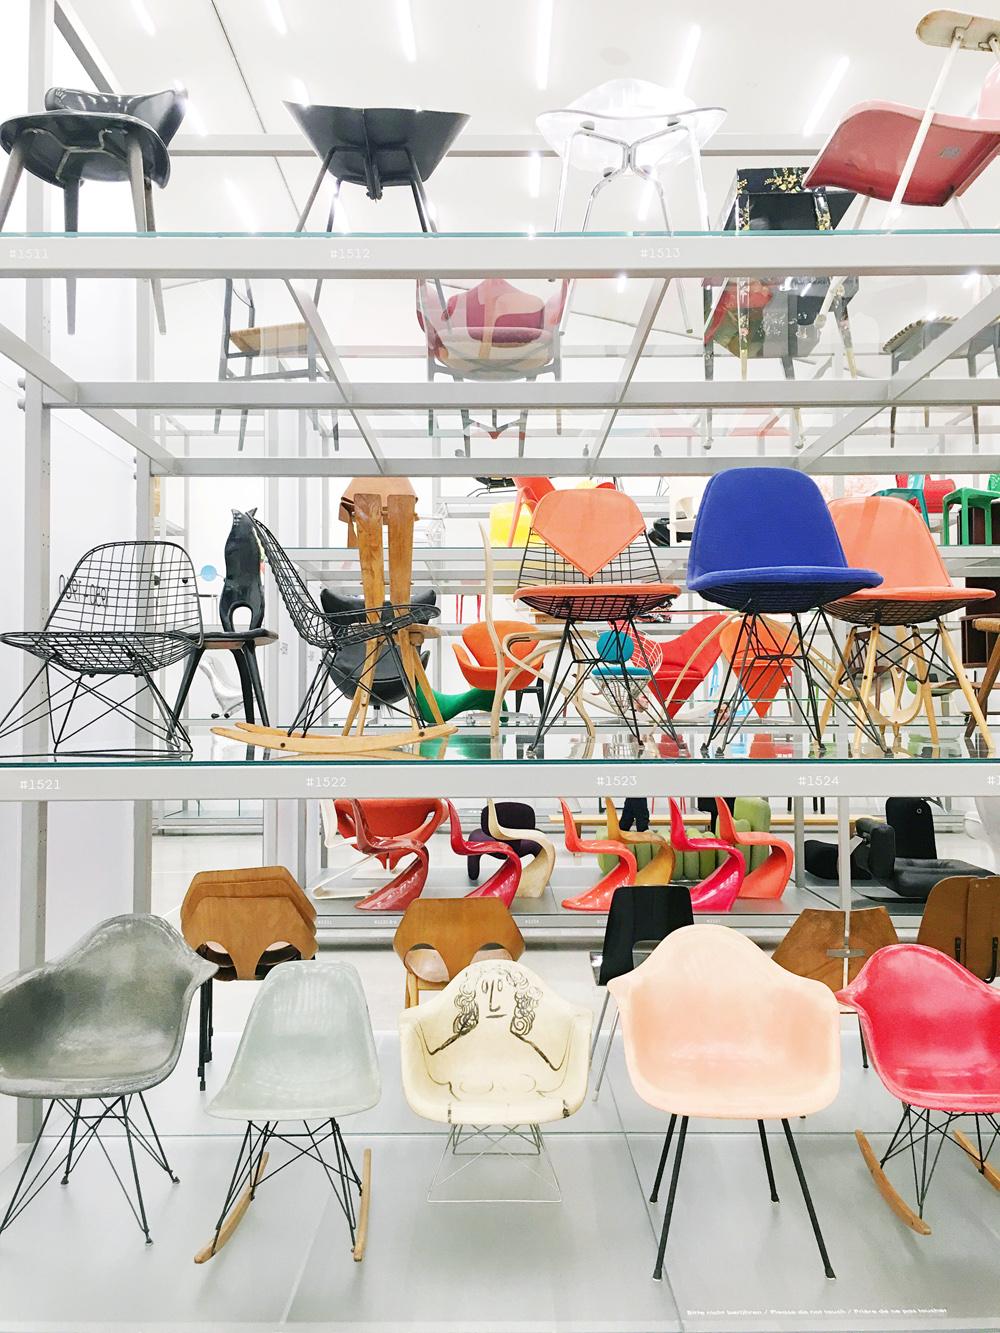 schaudepot-vitra-museum-chairs